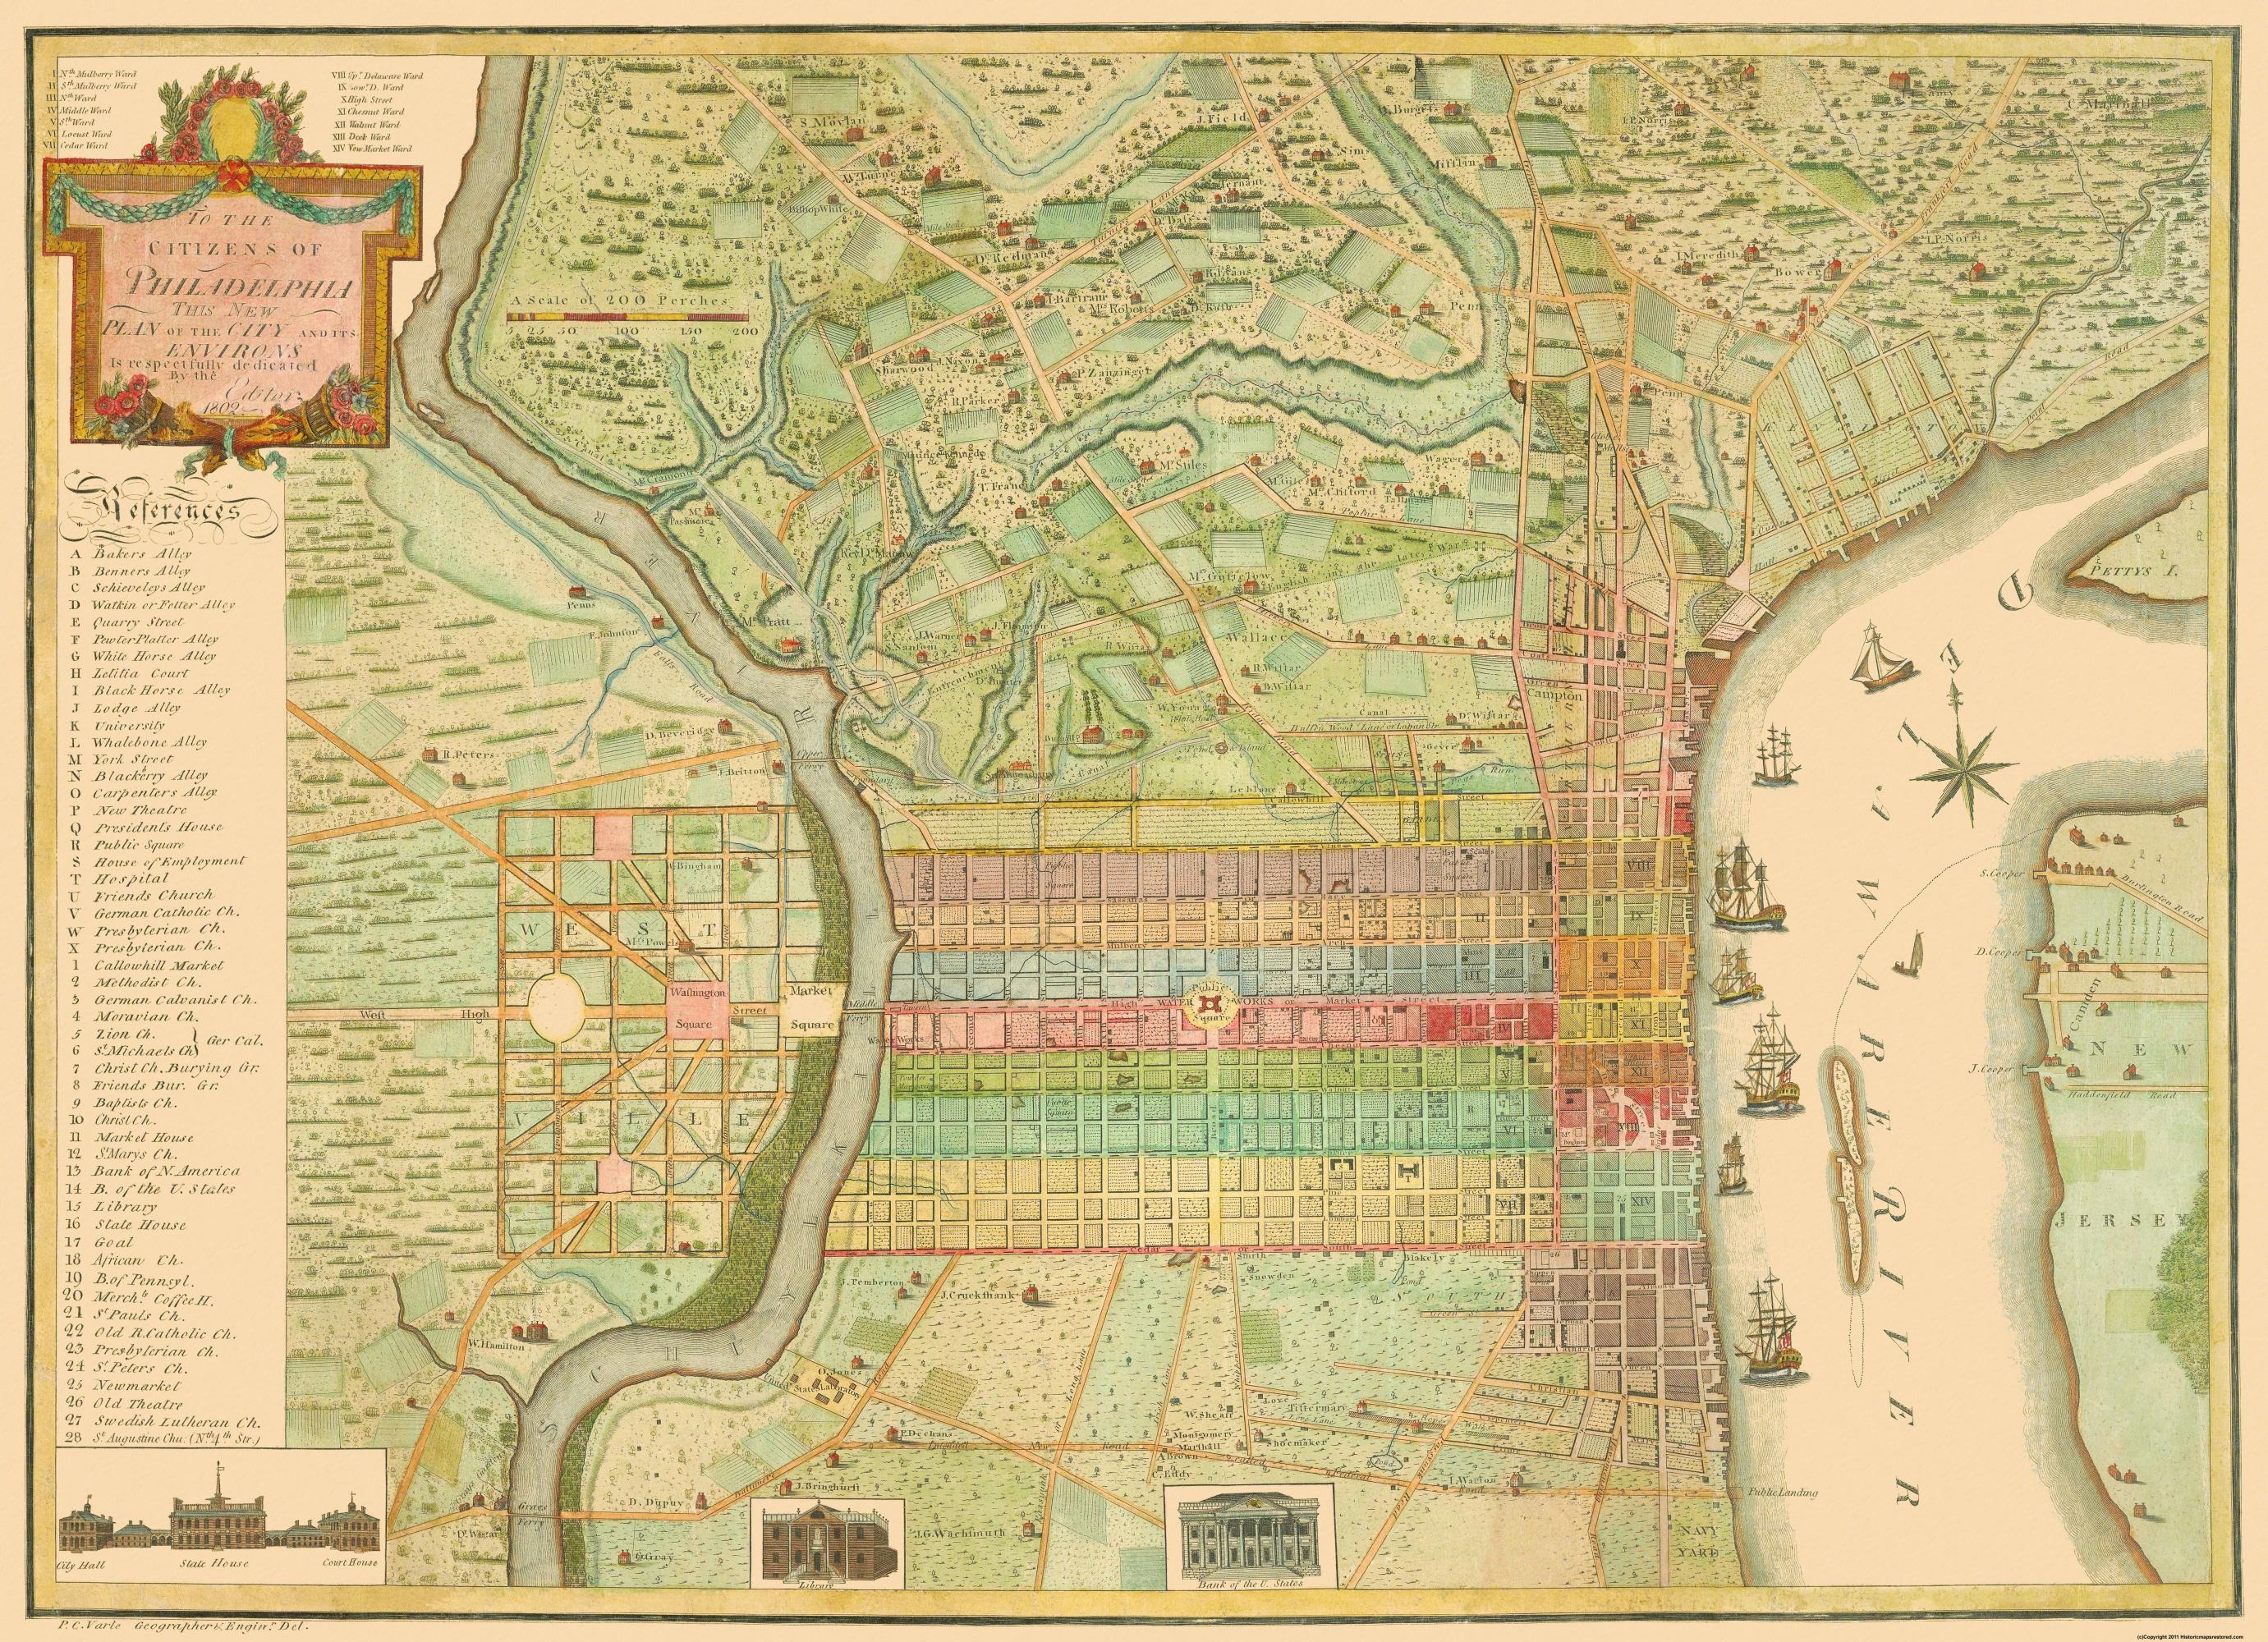 Old City Map - Philadelphia Pennsylvania Landowner - 1802